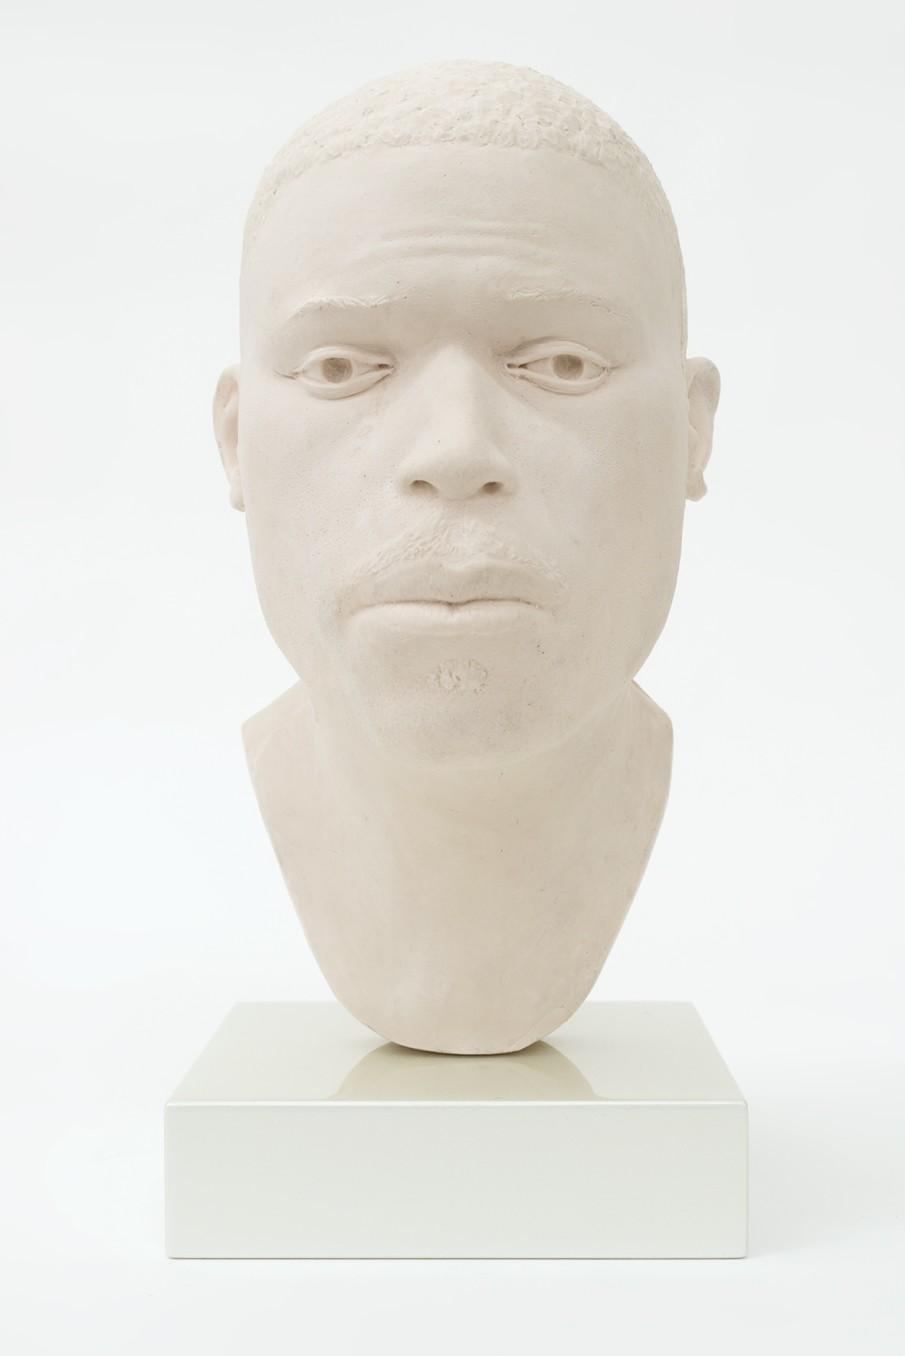 Thomas J Price, Head 16, 2017, acrylic composite, perspex and automotive spray paint, 19.2 x 8.5 x 12 cm, 7 1/2 x 3 3/8 x 4 3/4 in